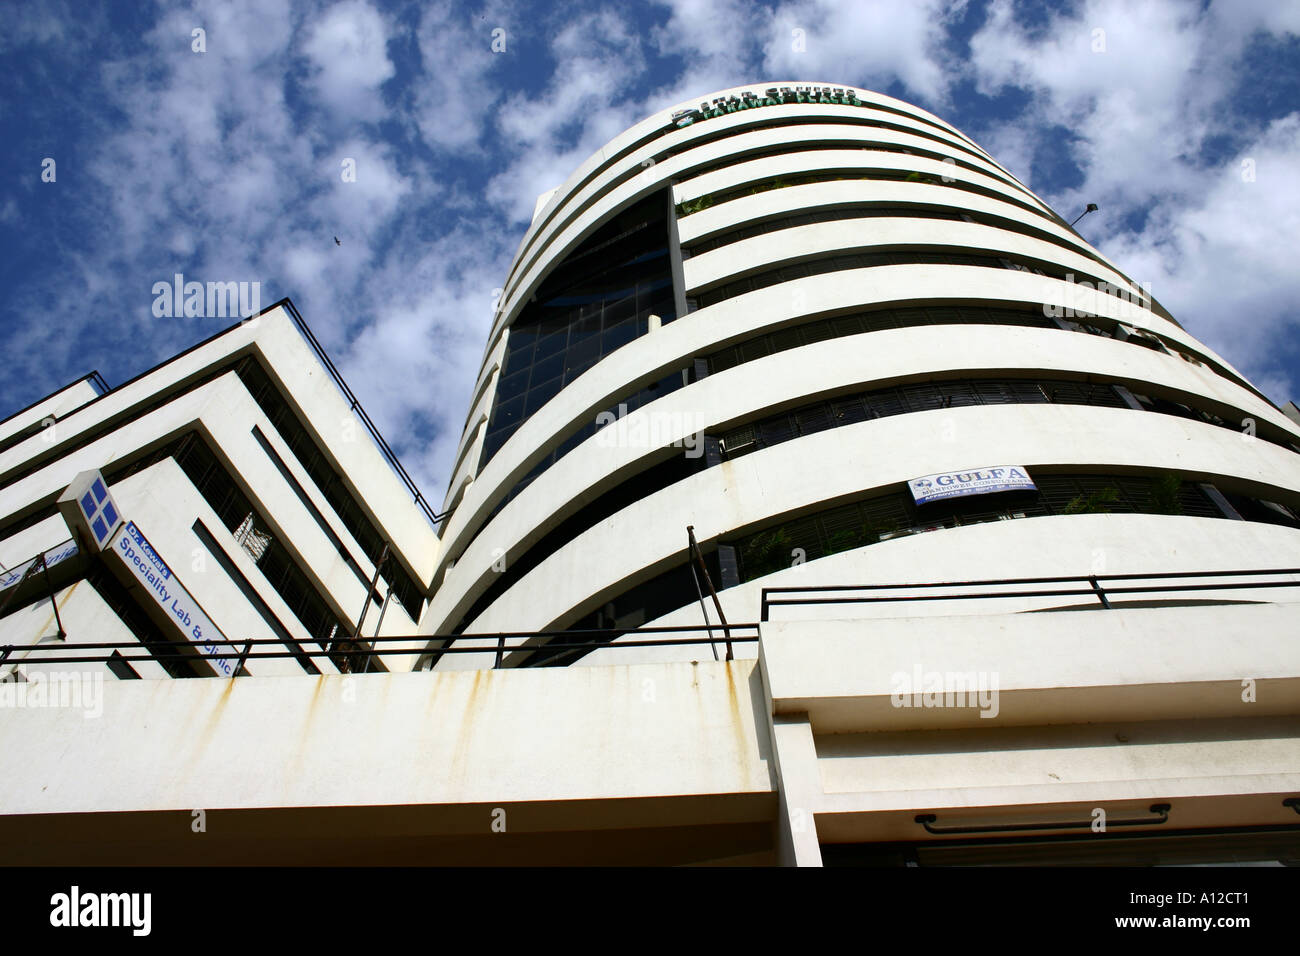 Le RSC75077 architecture bâtiment indien moderne Andheri west Mumbai Maharashtra Inde Photo Stock